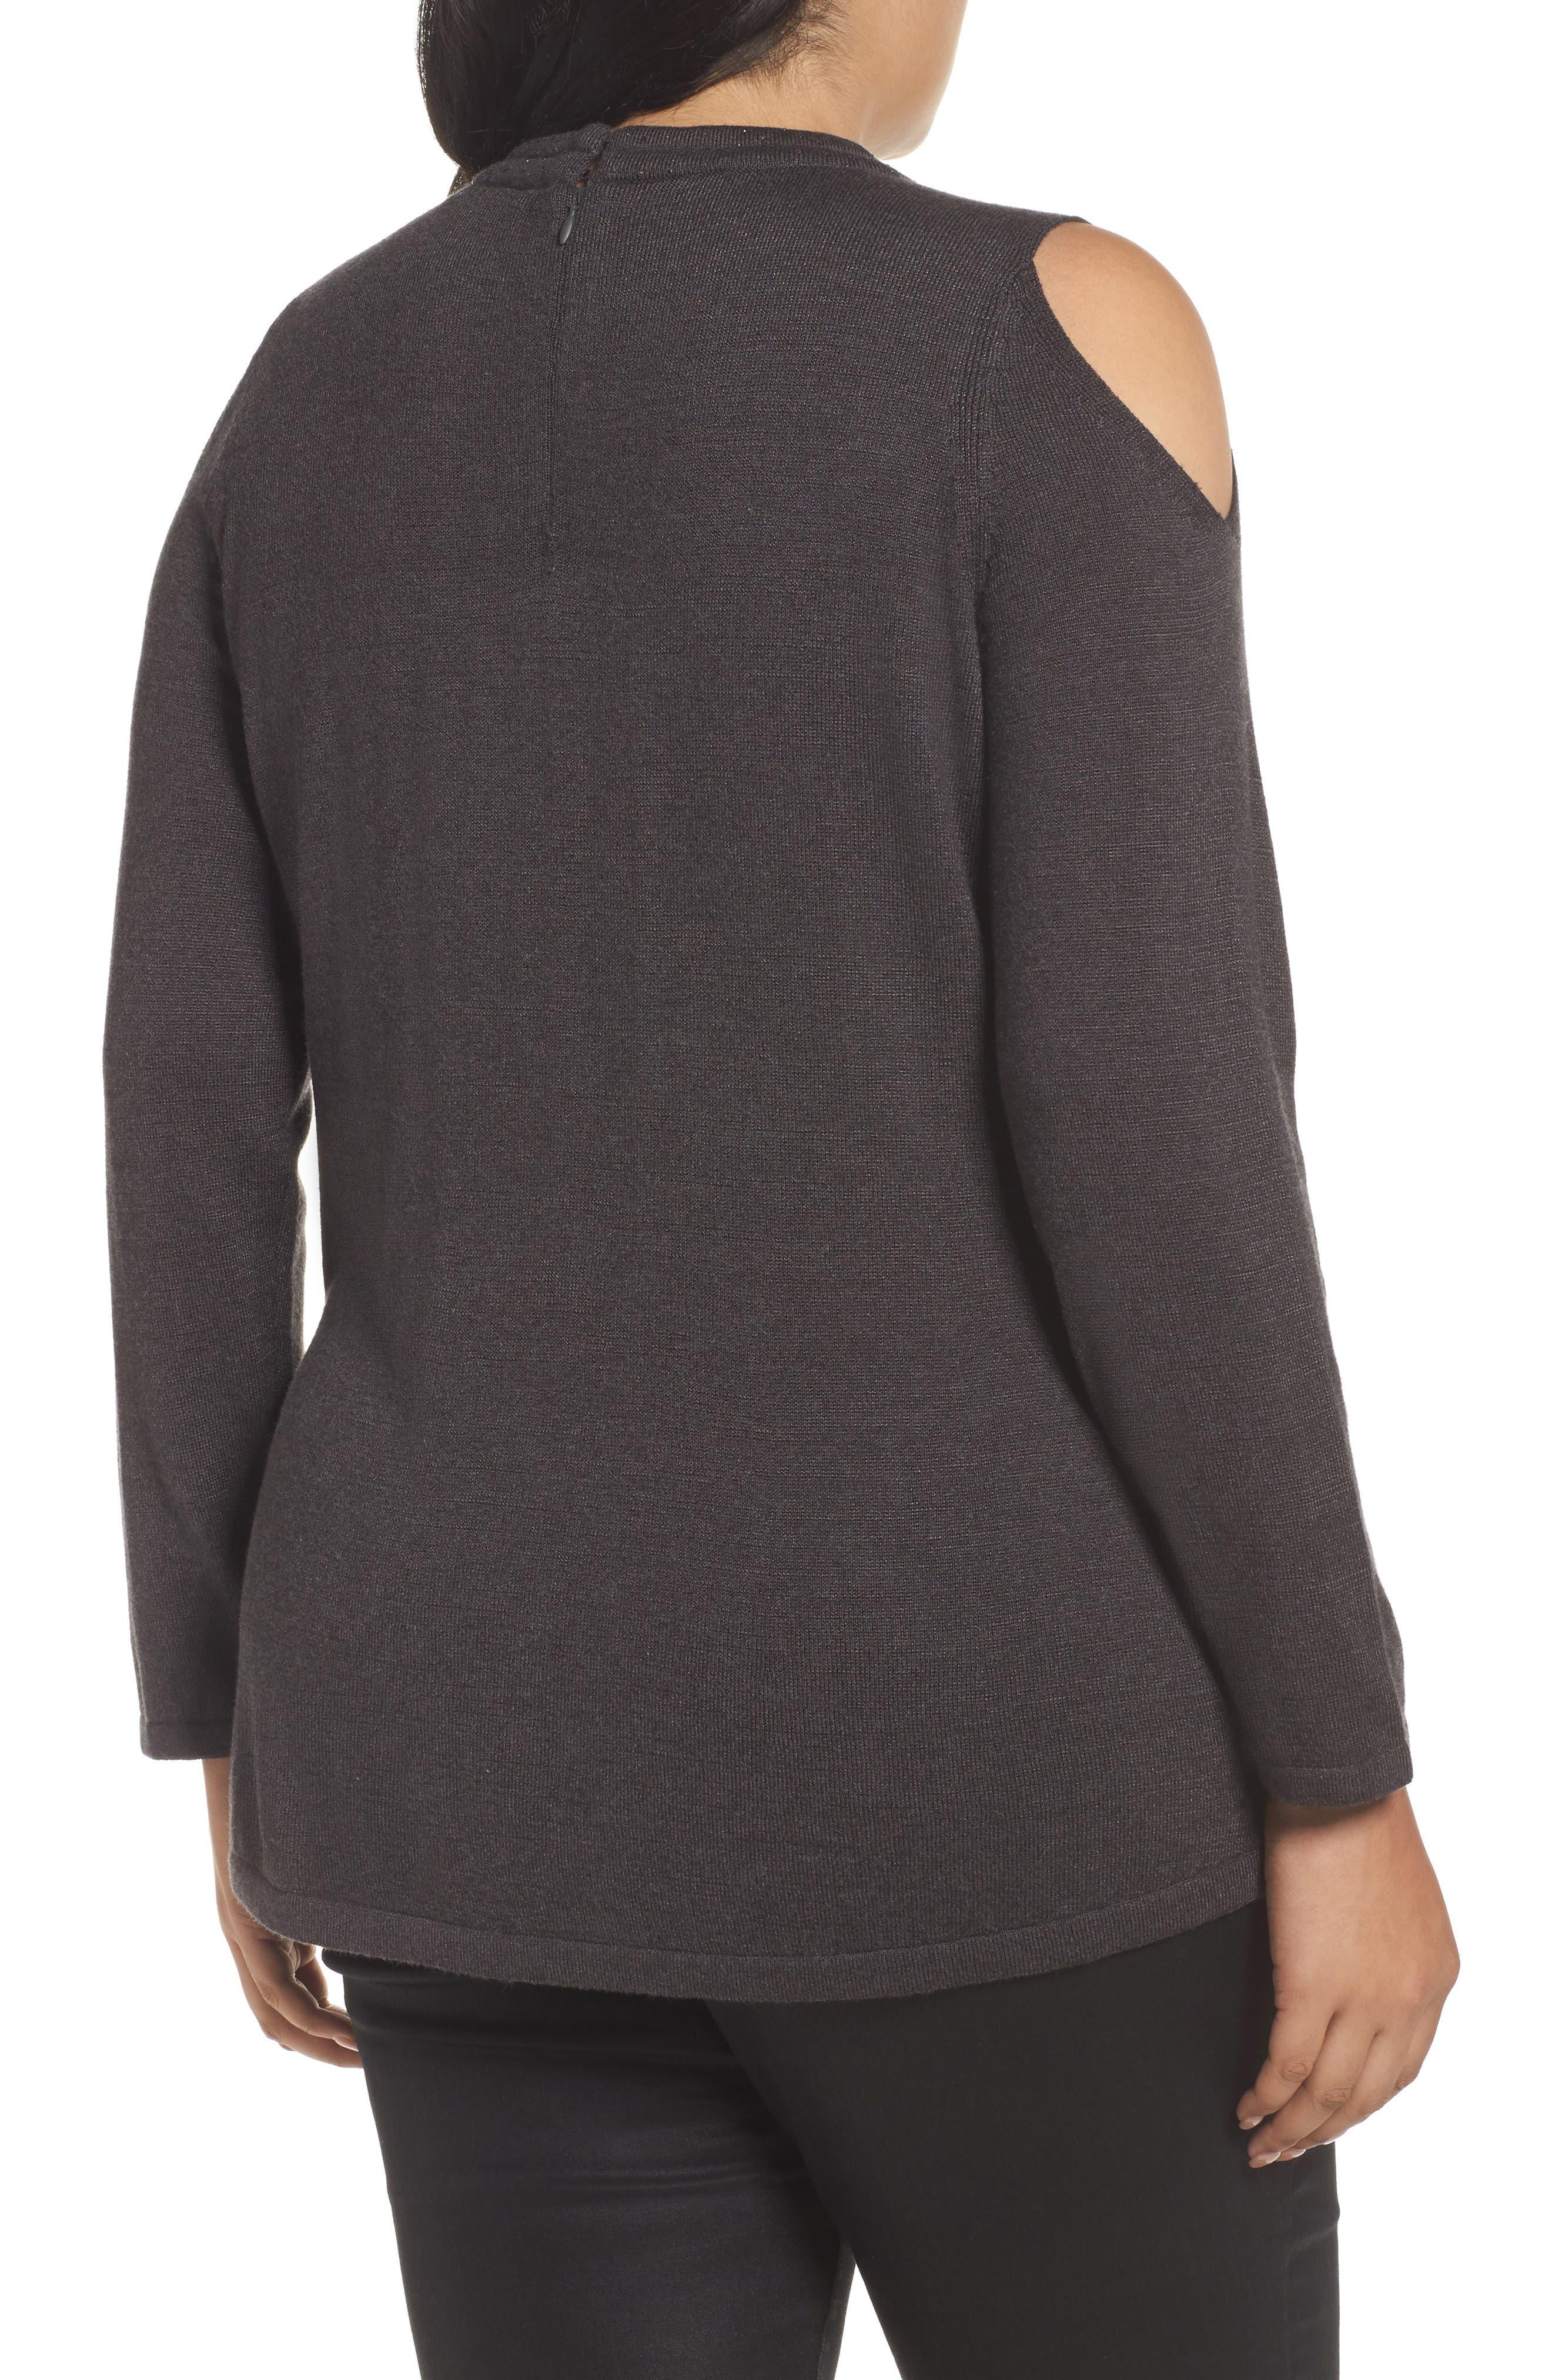 Alternate Image 2  - NIC+ZOE Jeweled Neck Cold Shoulder Sweater (Plus Size)